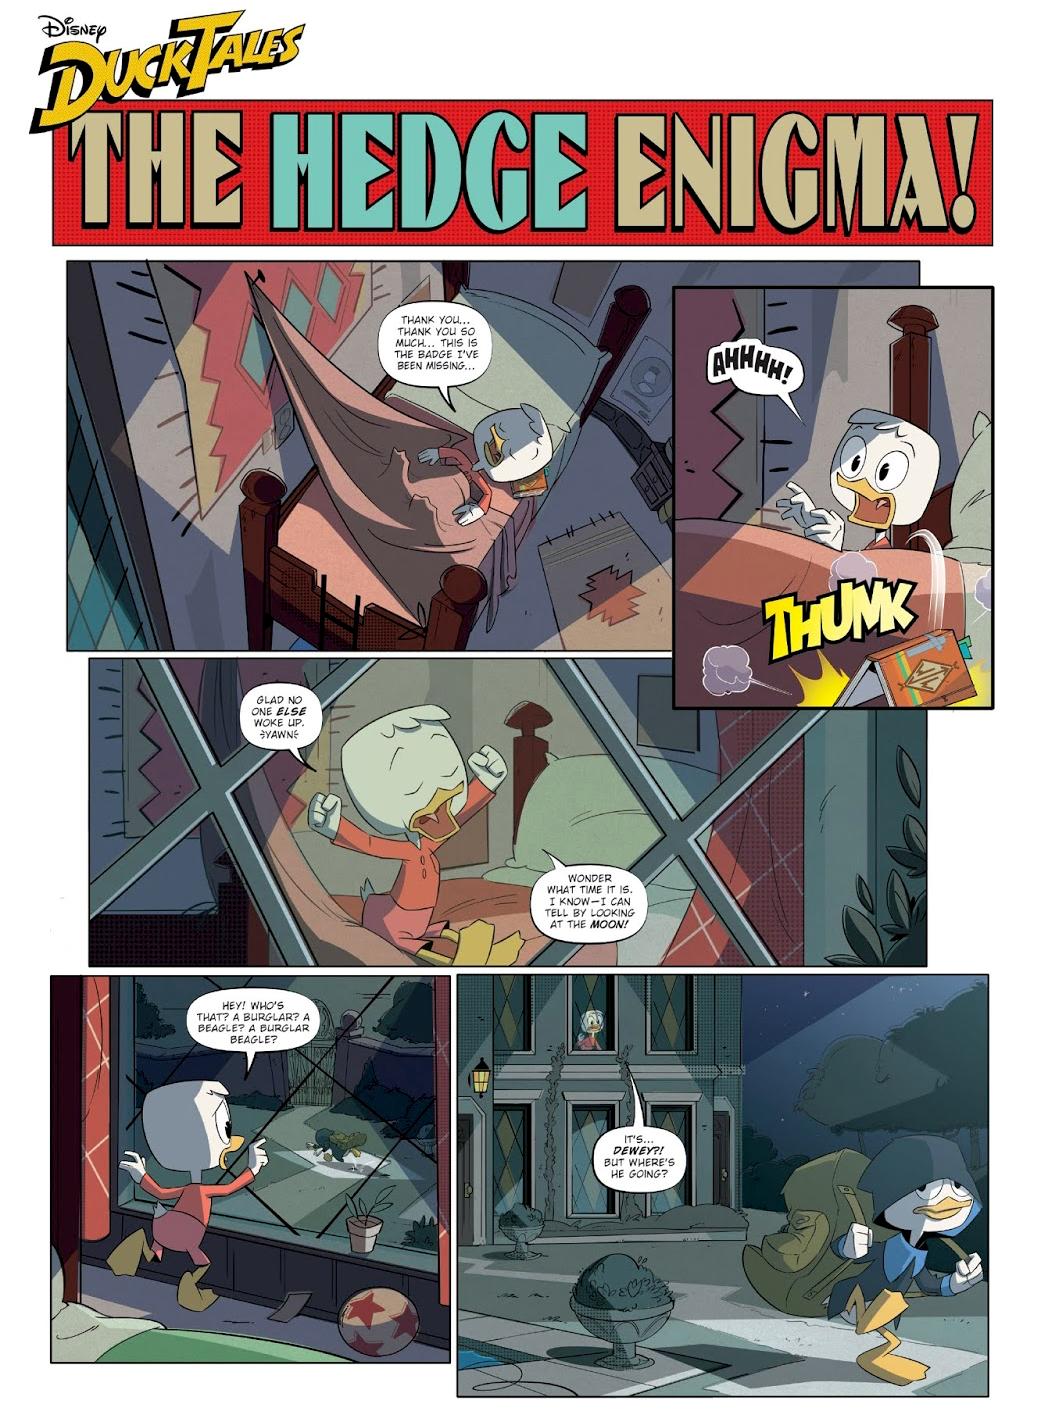 The Hedge Enigma